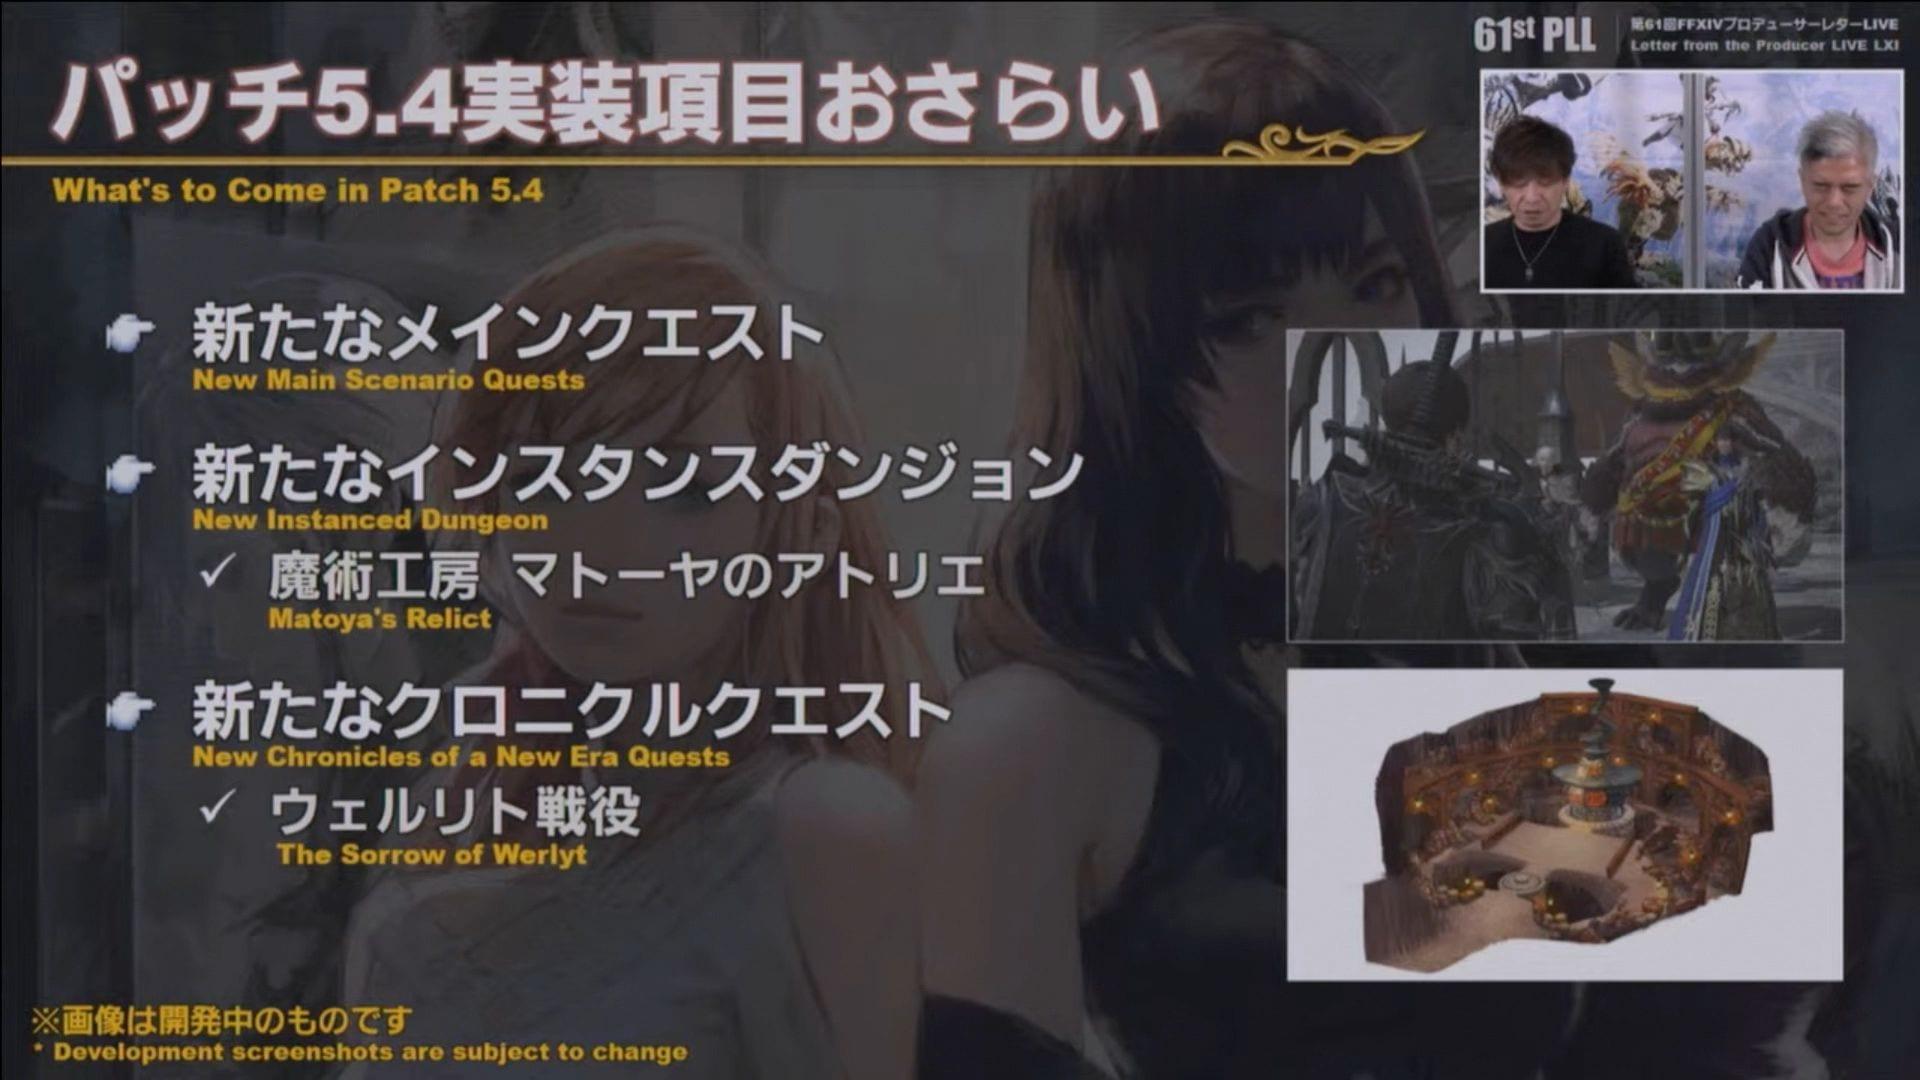 Final-Fantasy-XIV-Screenshot-2020-11-27-13-14-03-1.jpg